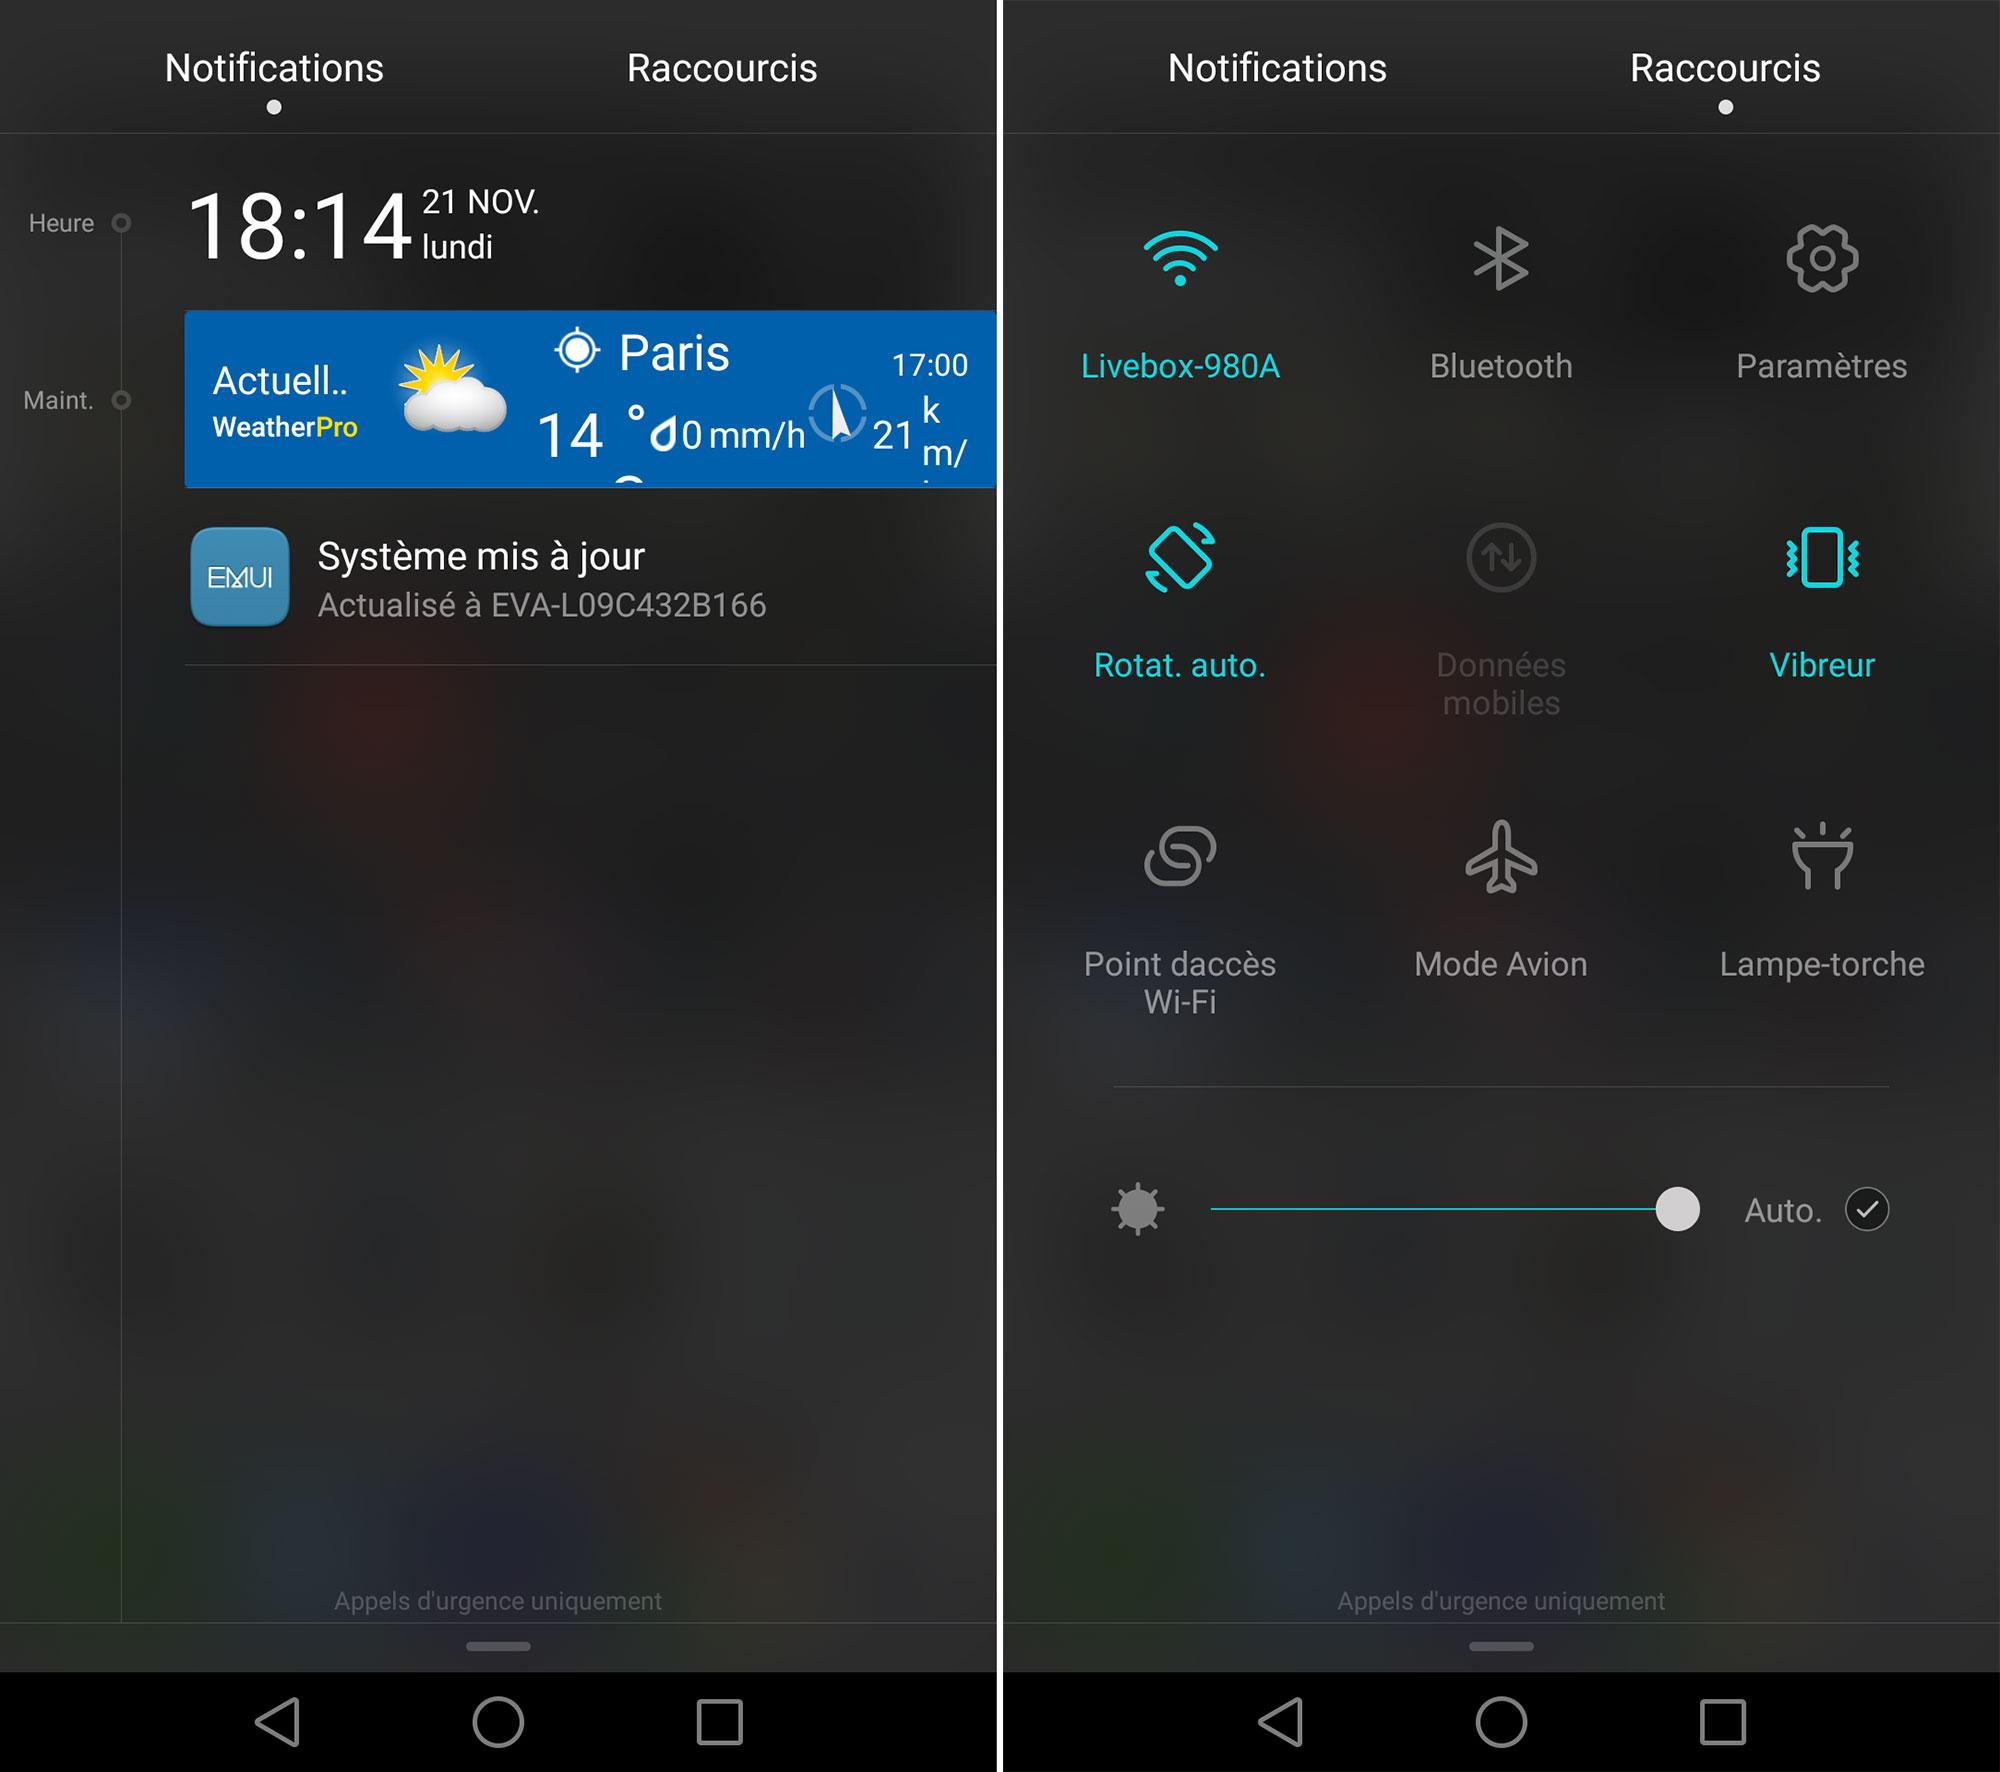 L'interface utilisateur du Huawei P9